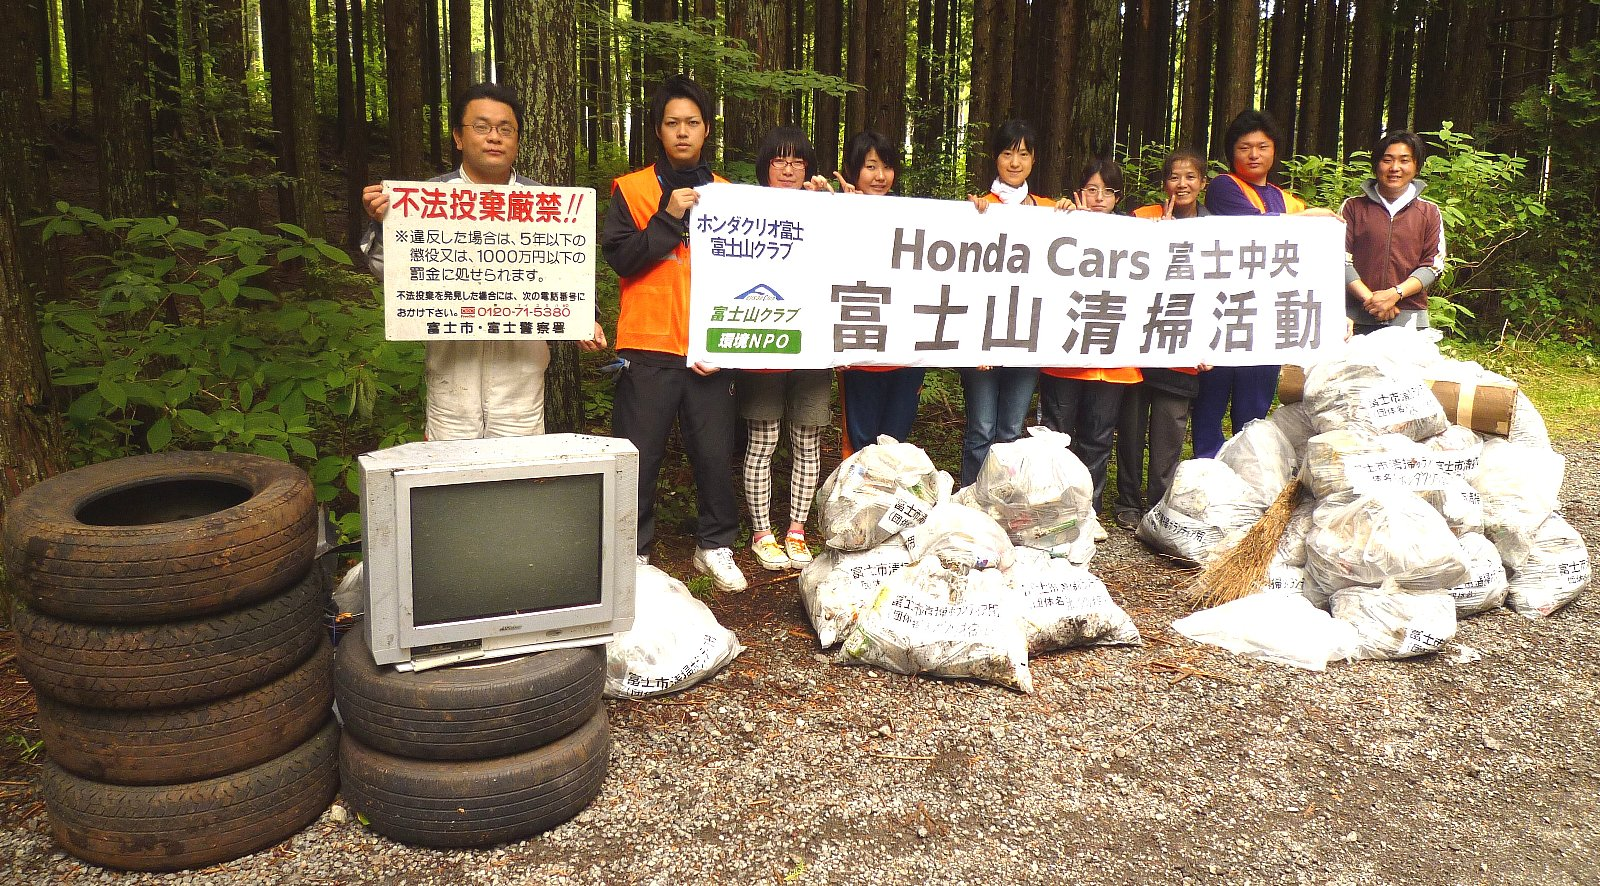 Honda Cars 富士中央の皆様と清掃活動を実施しました。